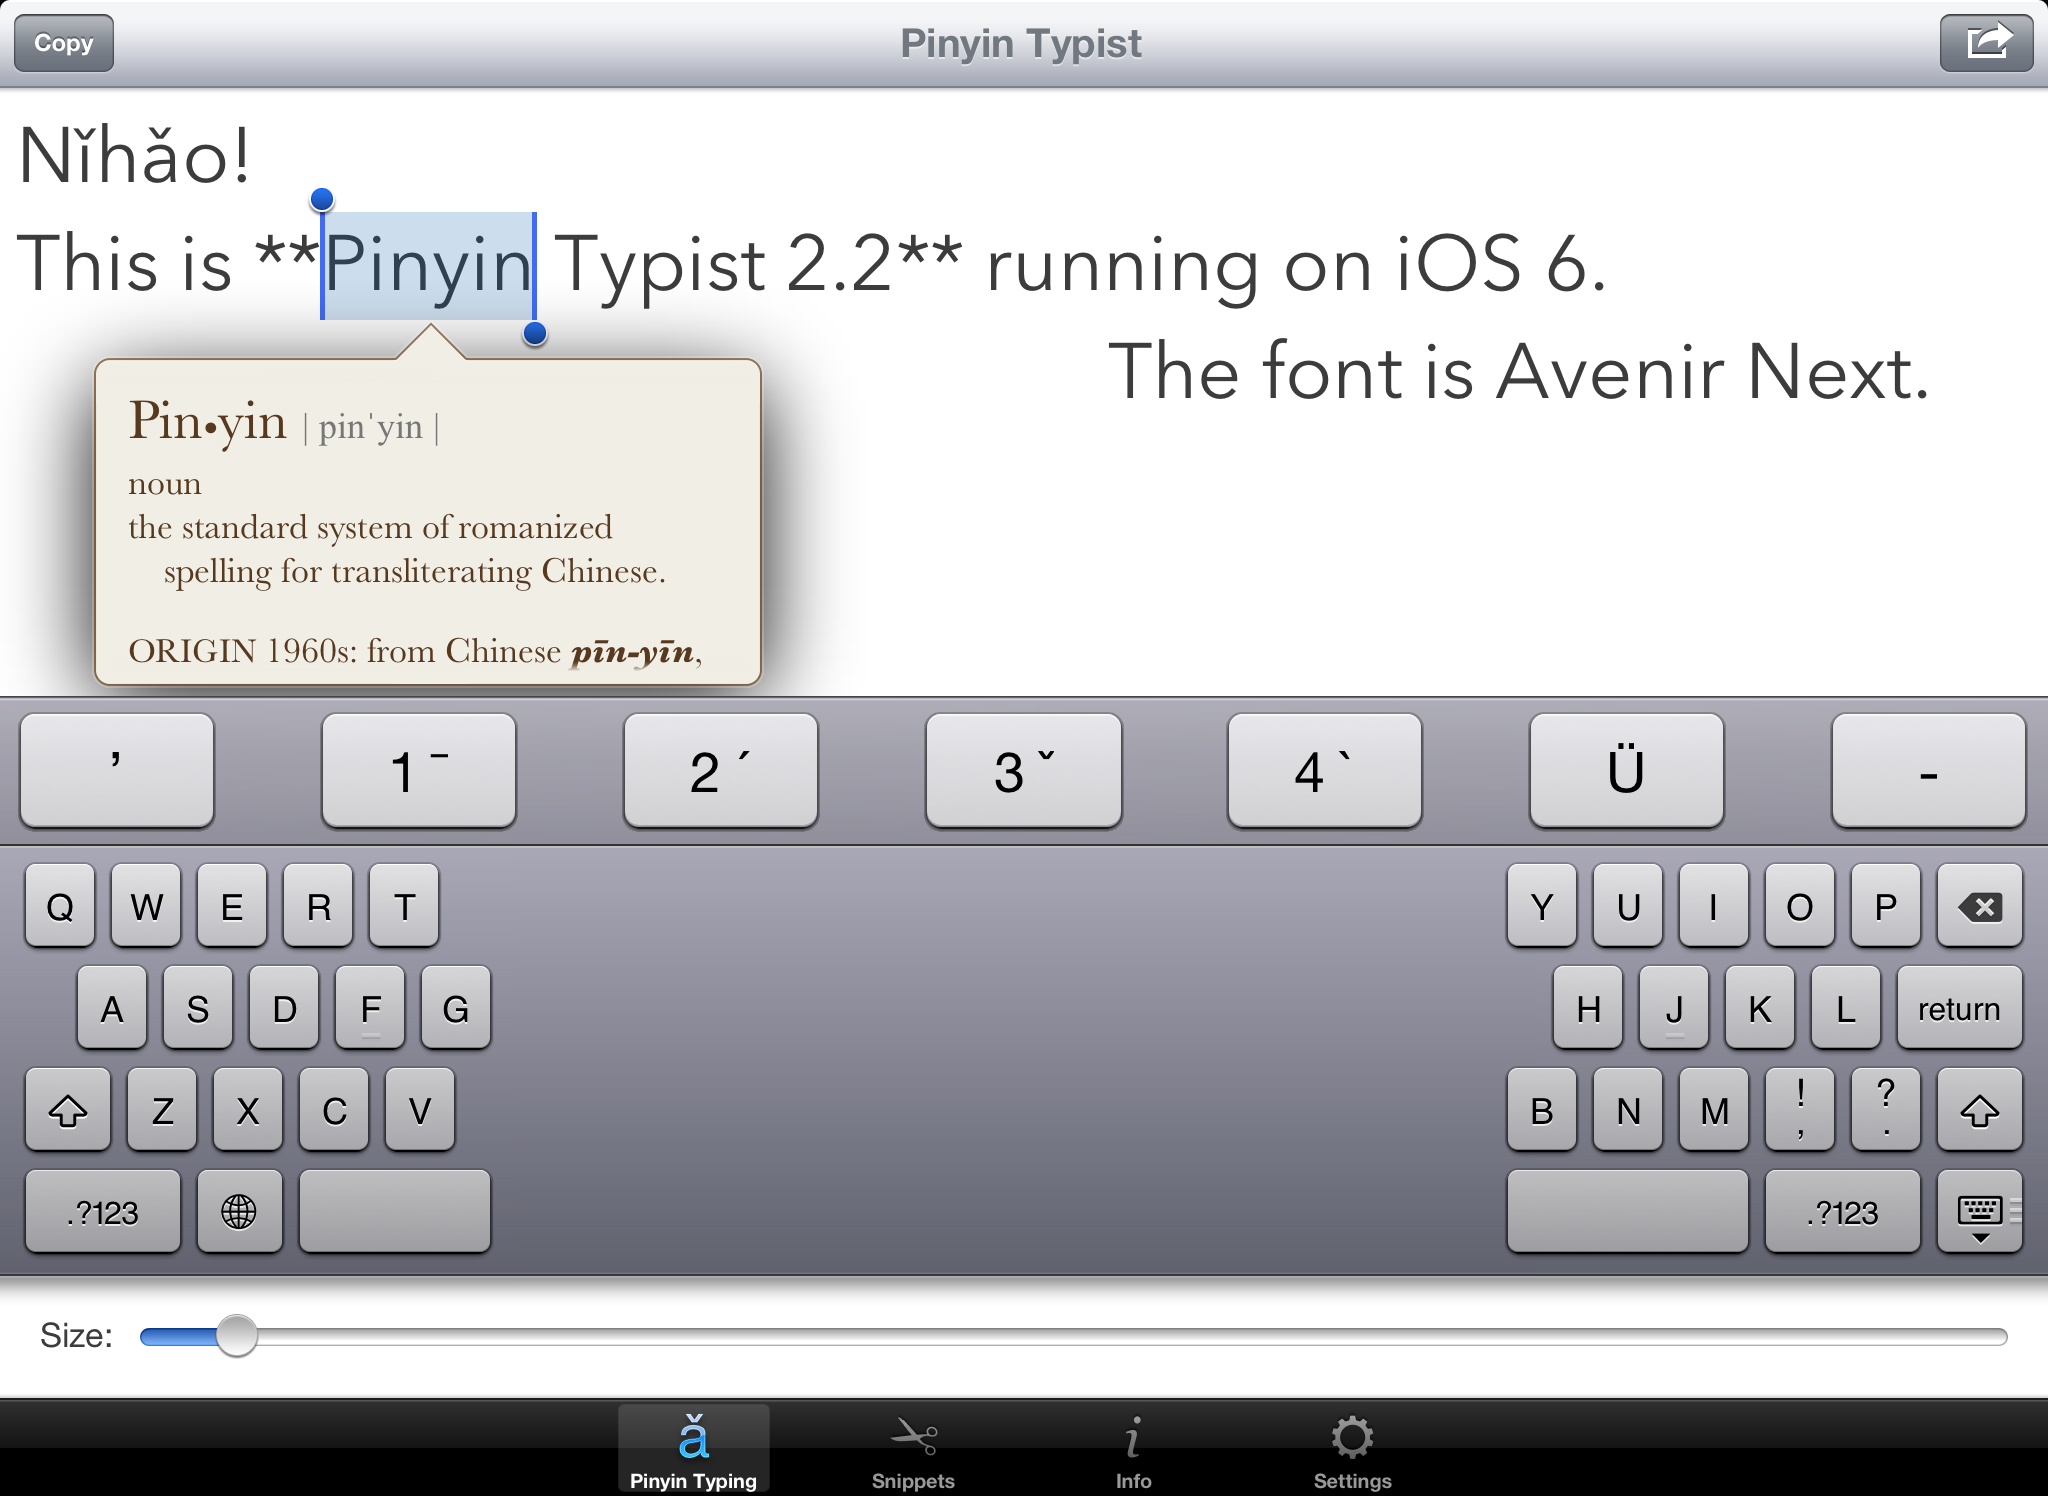 Pinyin Typist—iPad Screenshots